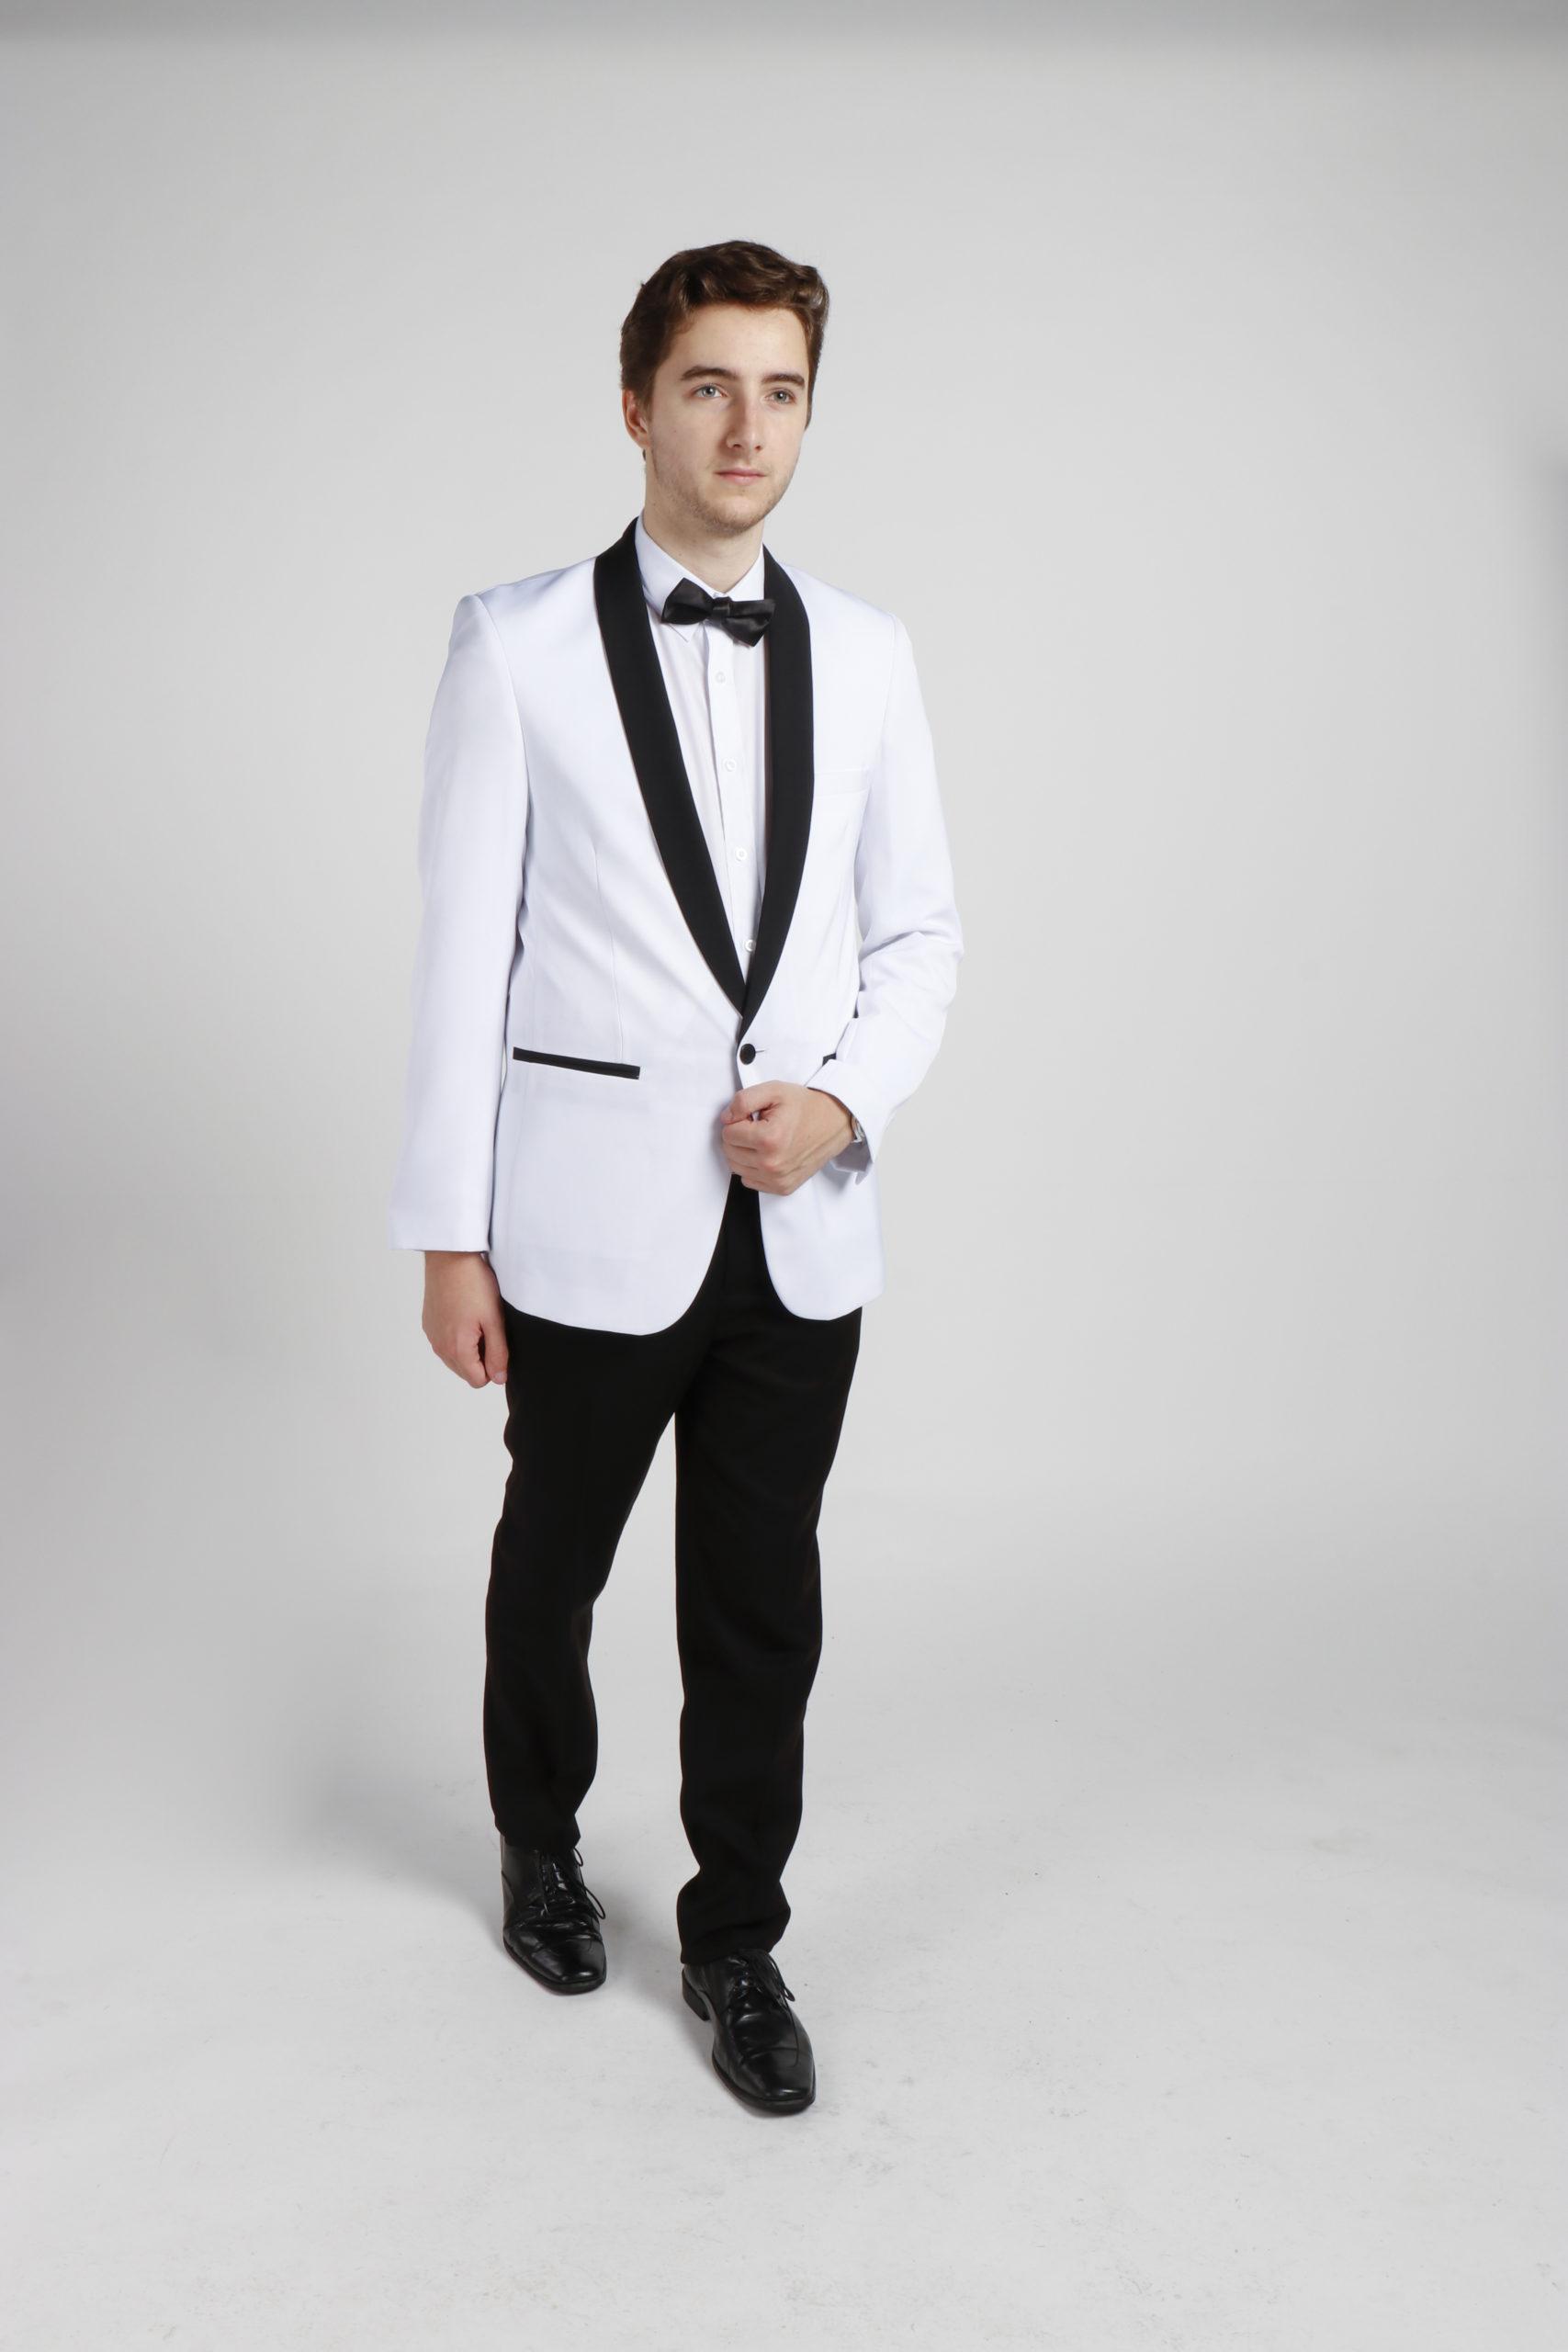 White Tuxedo with Black Lapels